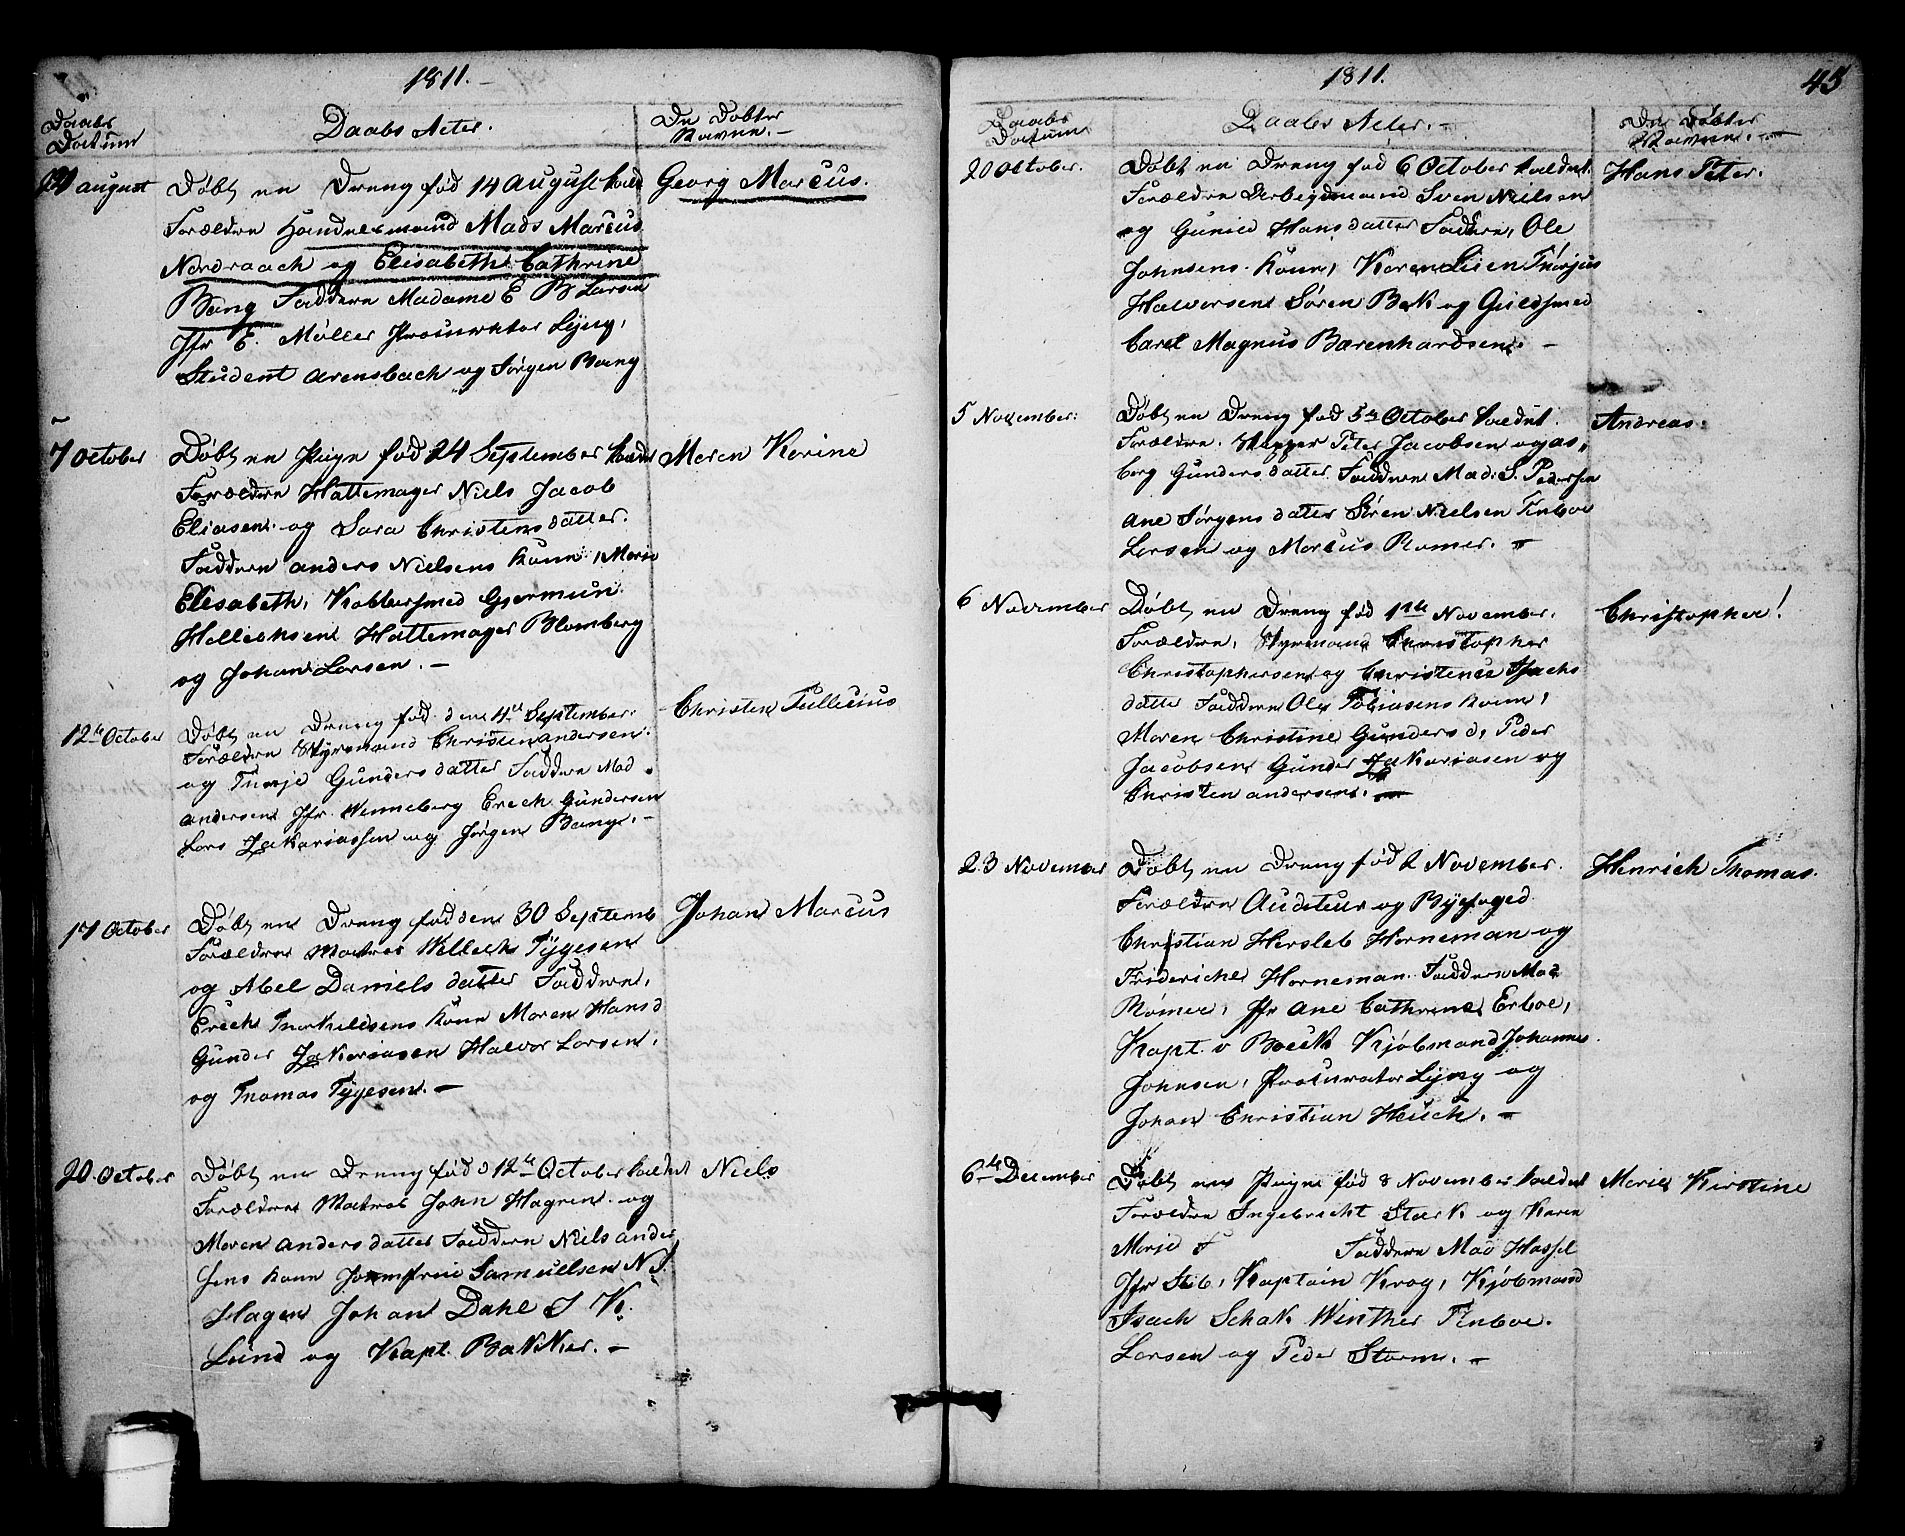 SAKO, Kragerø kirkebøker, F/Fa/L0003: Ministerialbok nr. 3, 1802-1813, s. 45